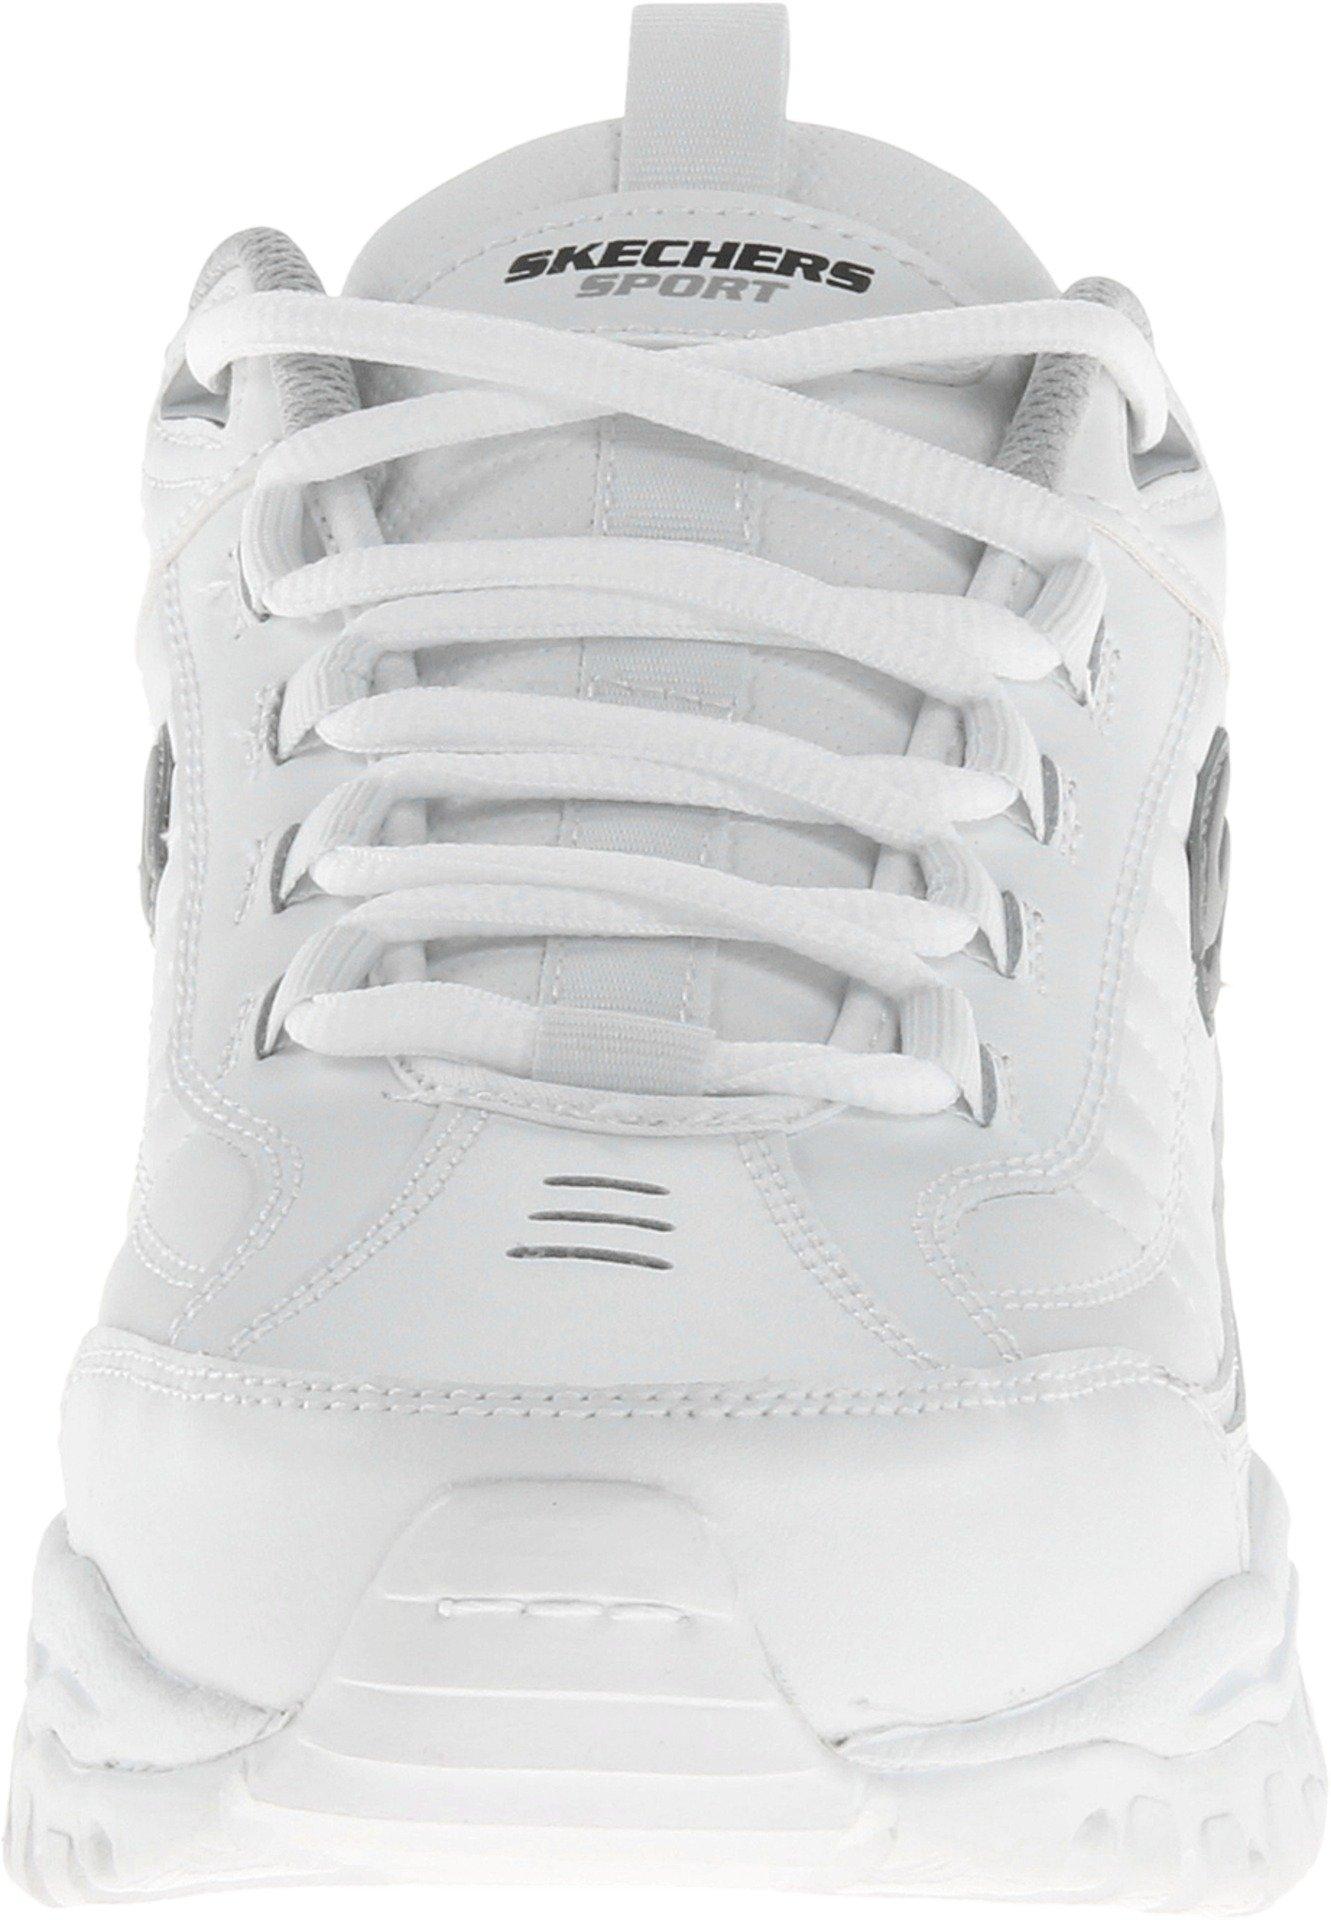 Skechers Men's Energy Afterburn Lace-Up Sneaker,White,8 M US by Skechers (Image #4)